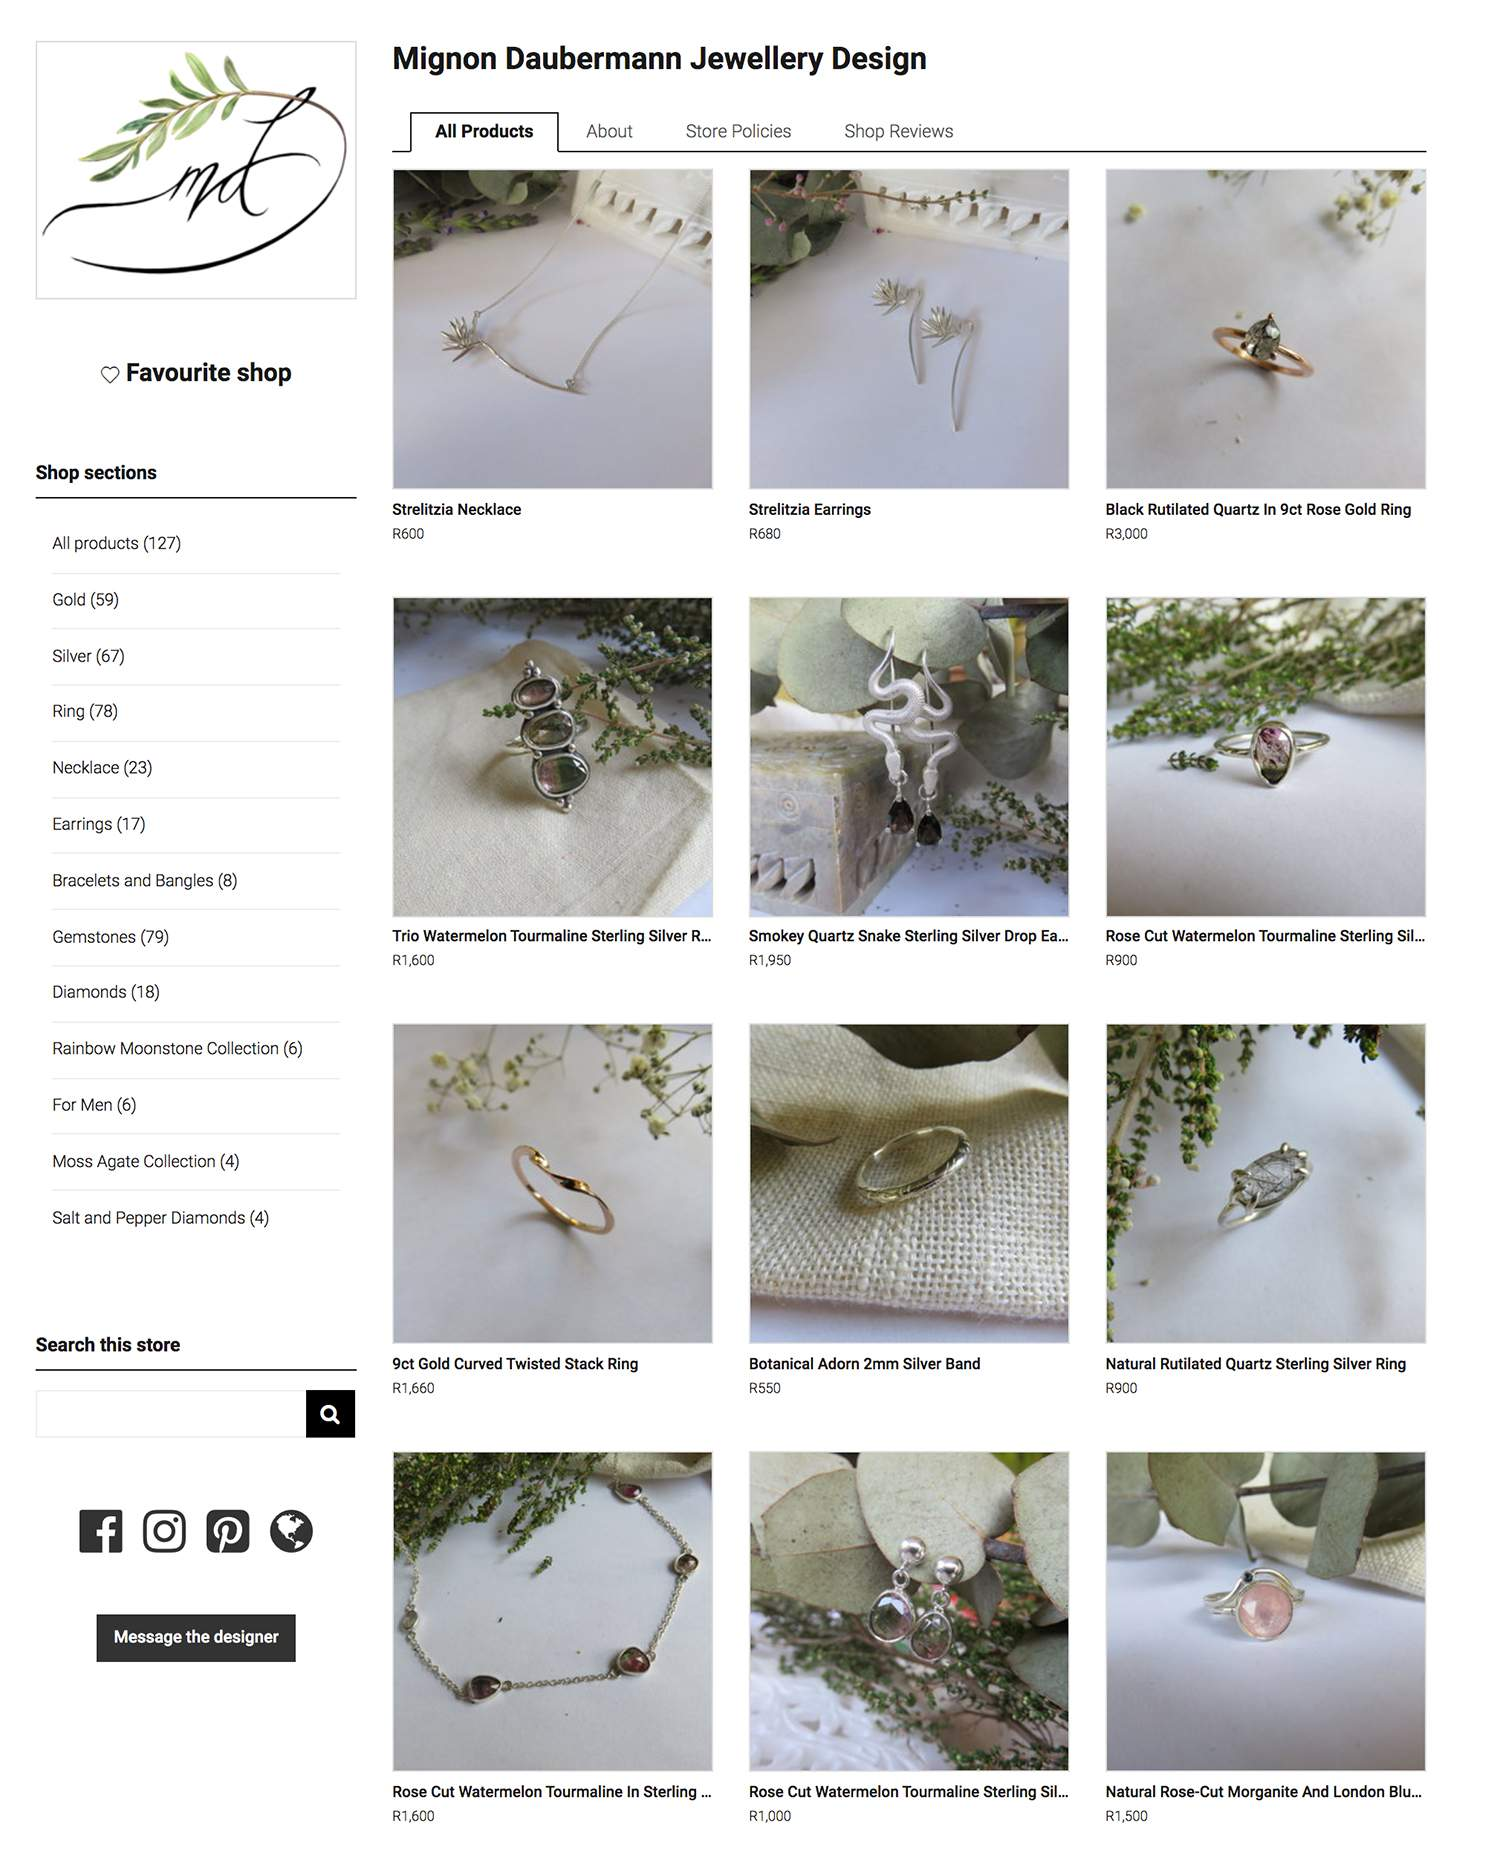 Mignon Daubermann Store Look & Feel